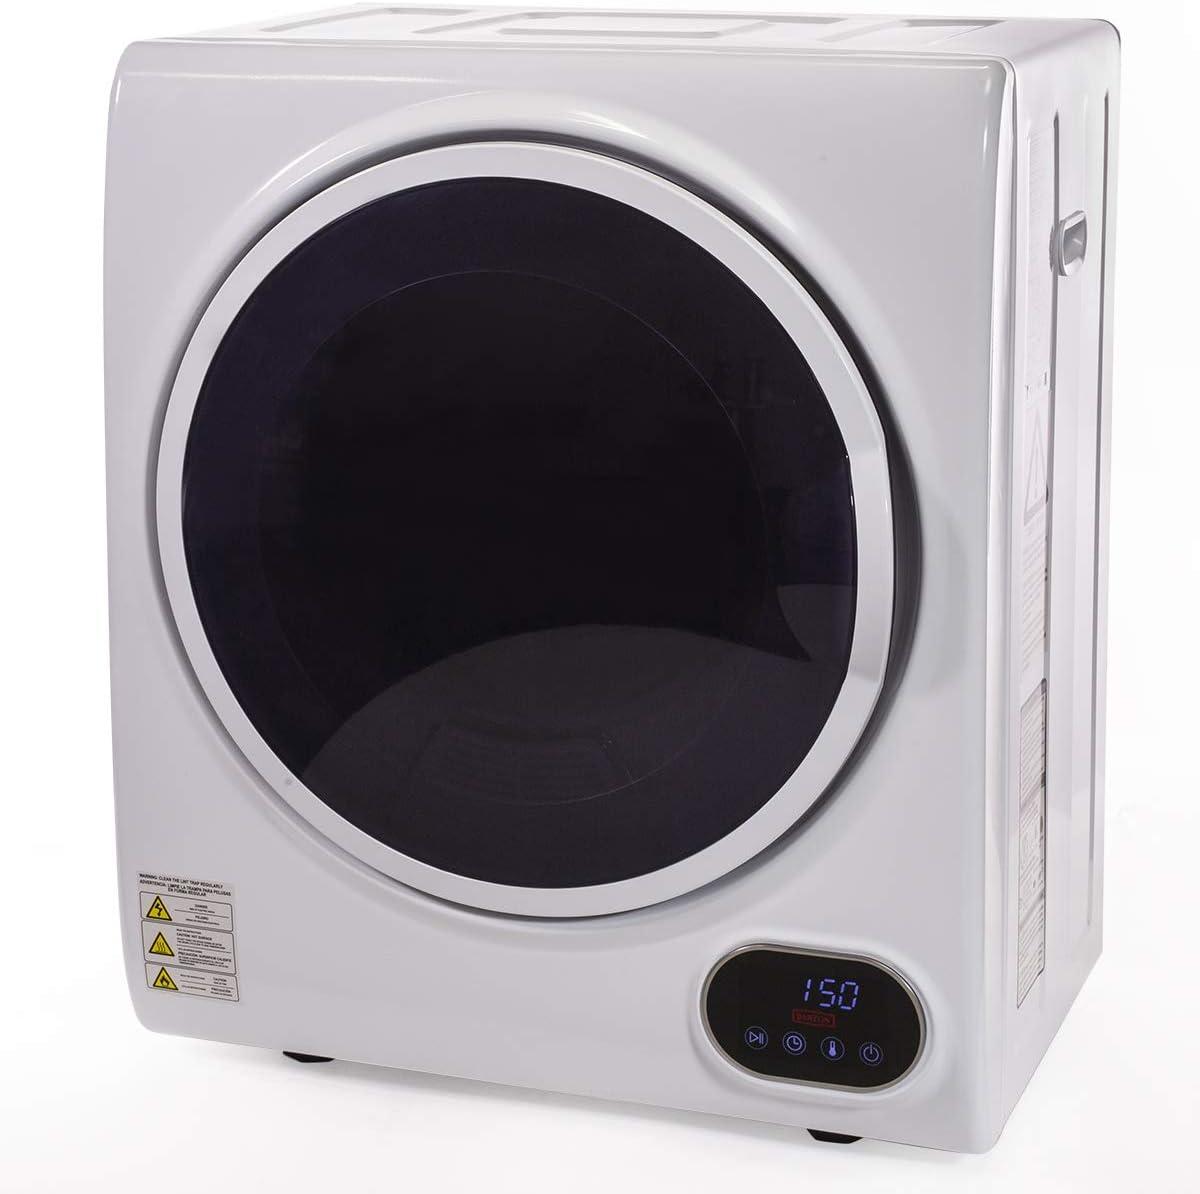 Dedication Barton Premium Digital Electric famous Dryer Machine Laundry Automatic